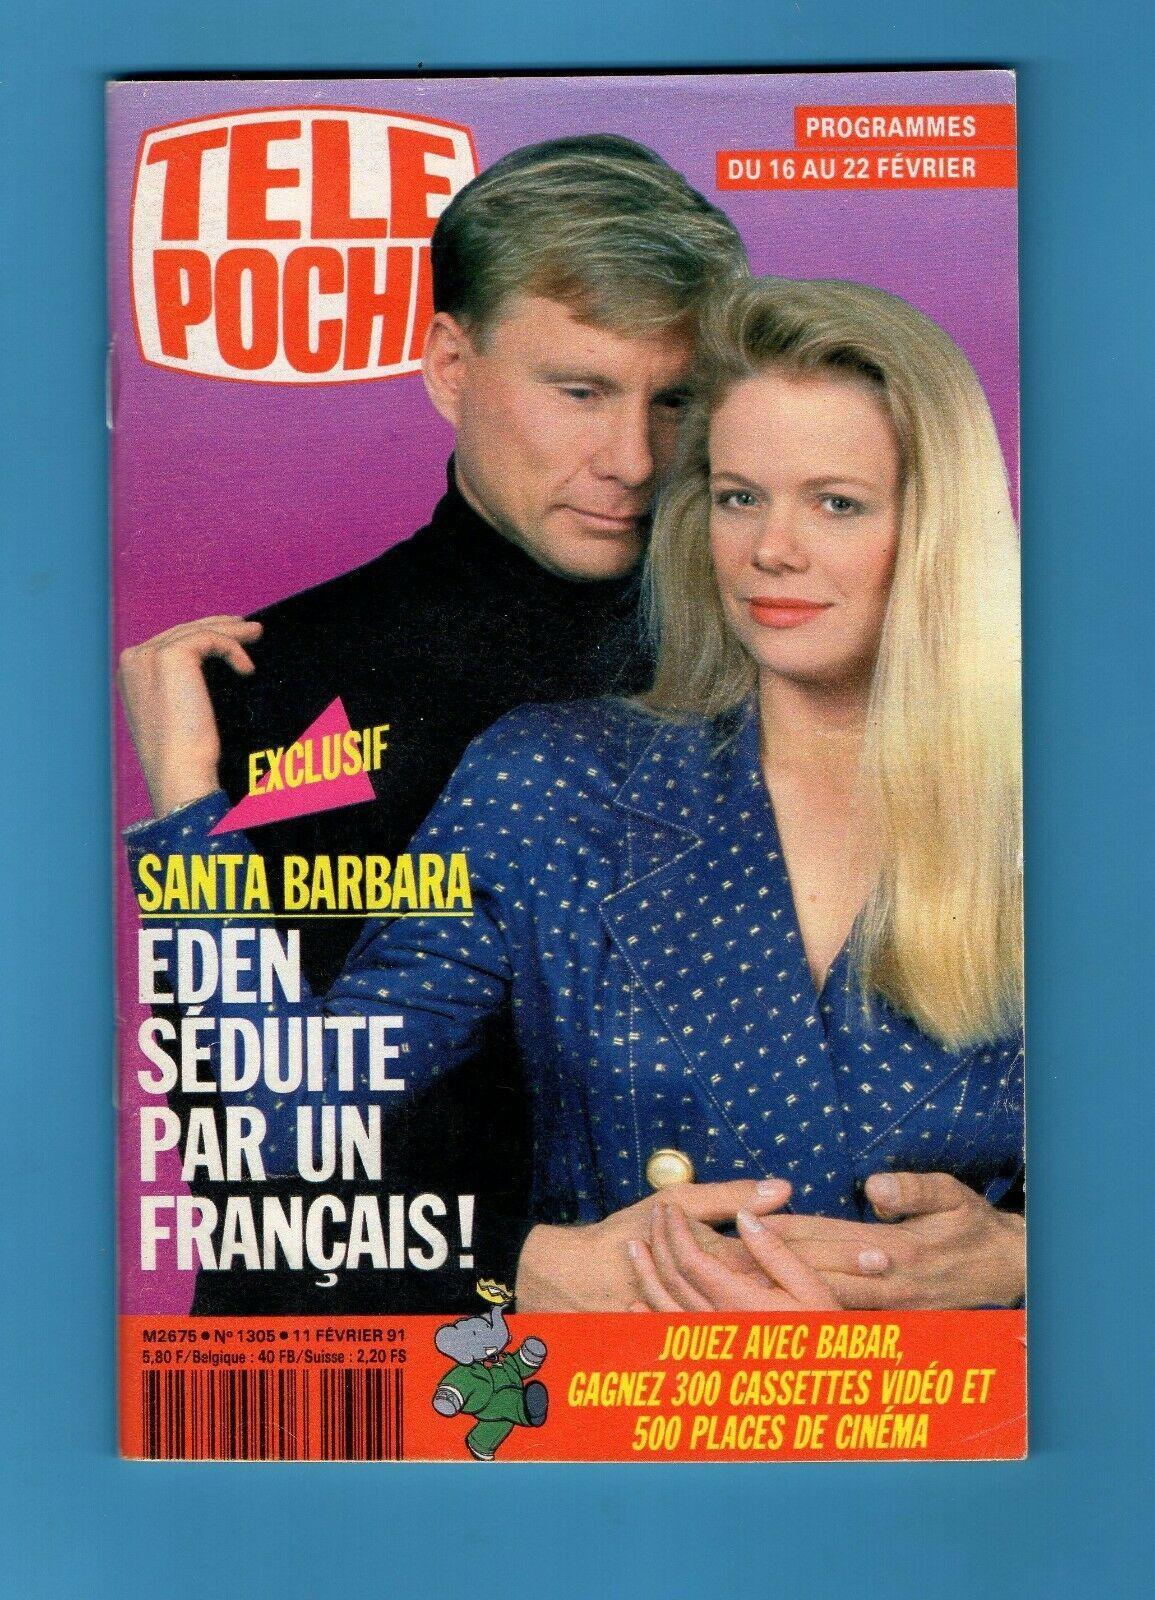 ►Tele-Poche-1305-1991-Sbarbara-George-Lucas.jpg